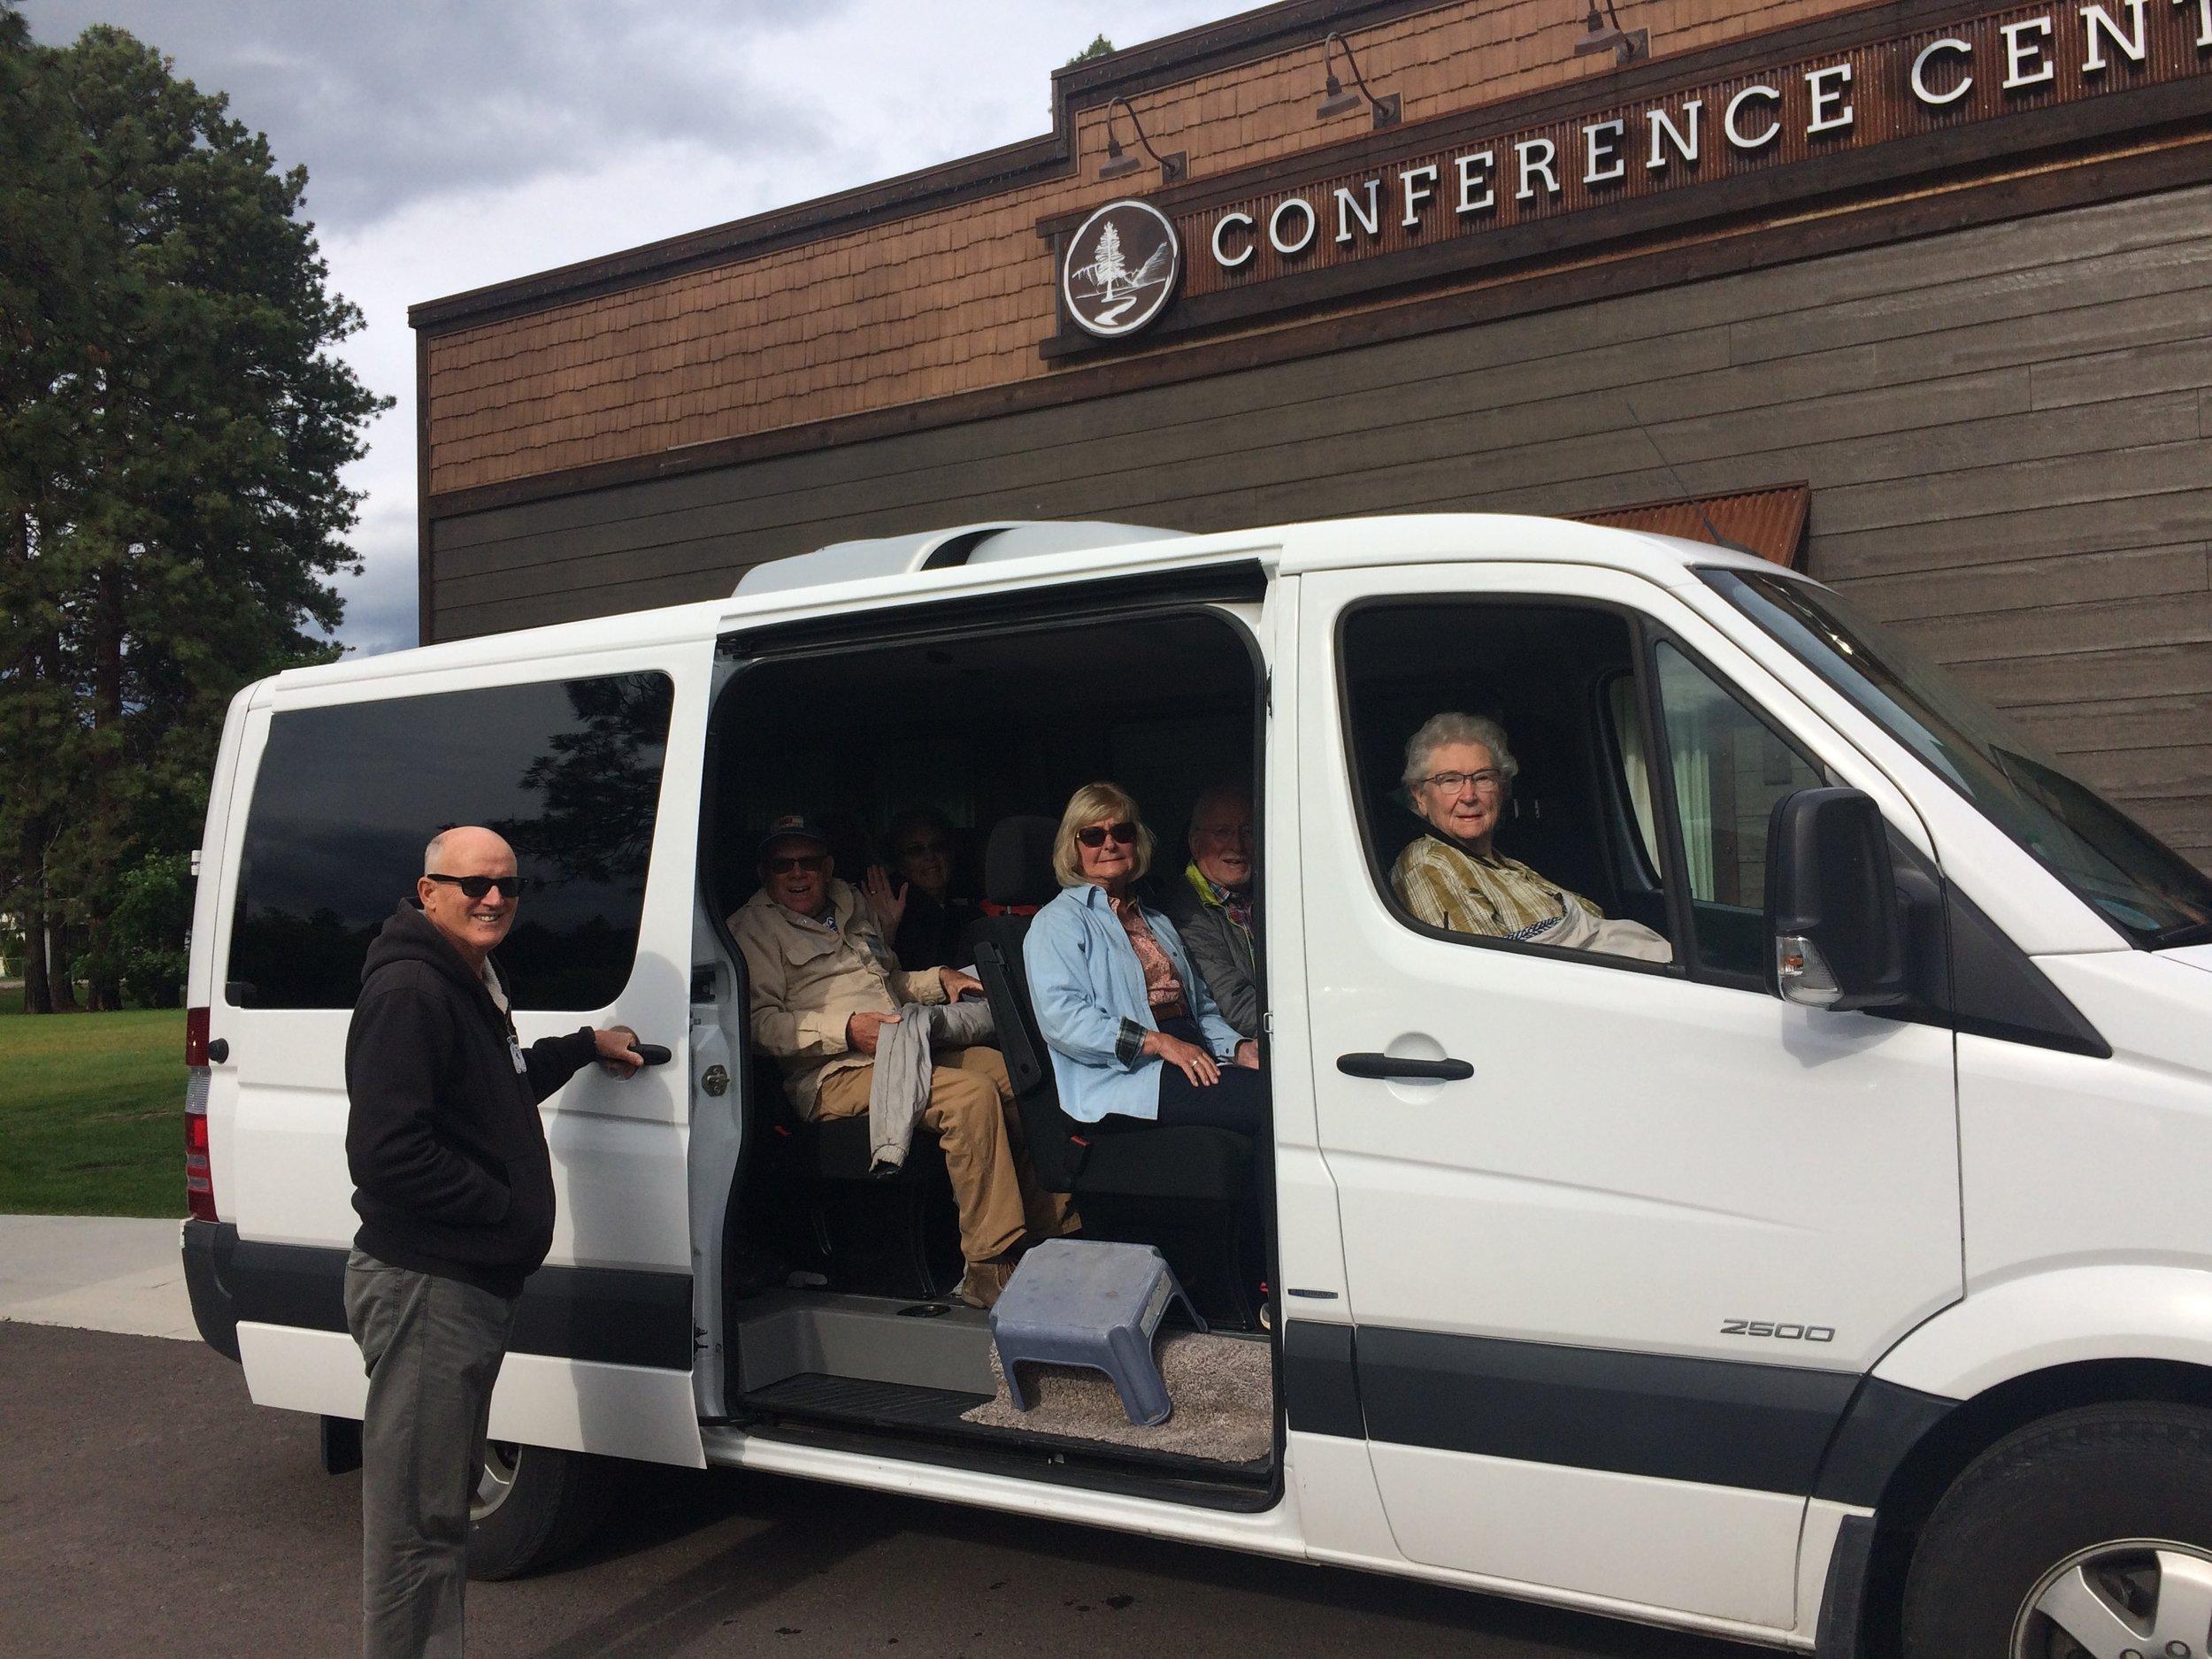 Spotted Bear Sprinter Tour